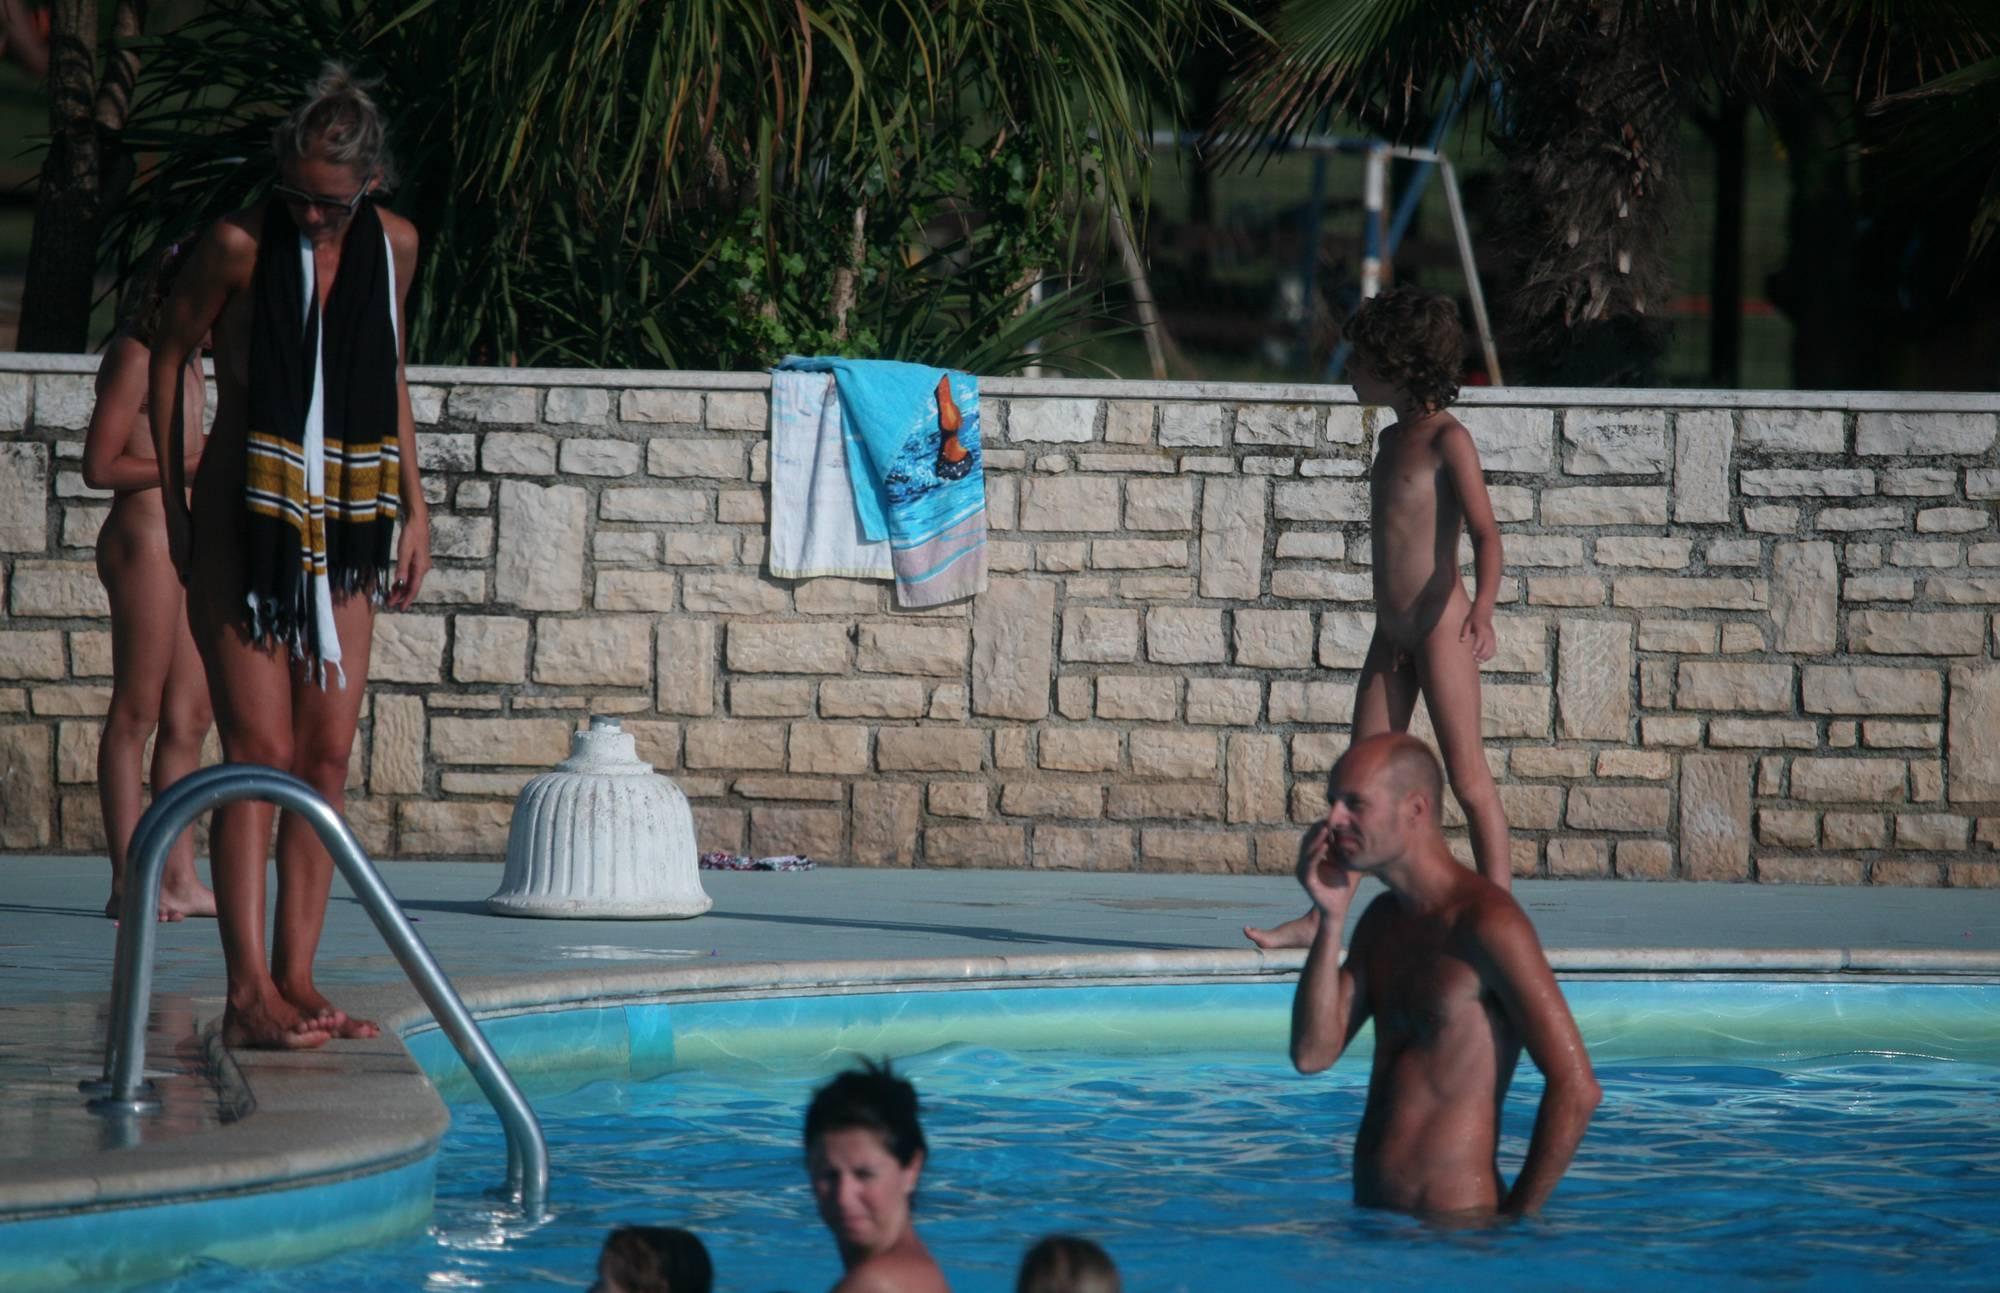 Two Poolside Nudist Girls - 1